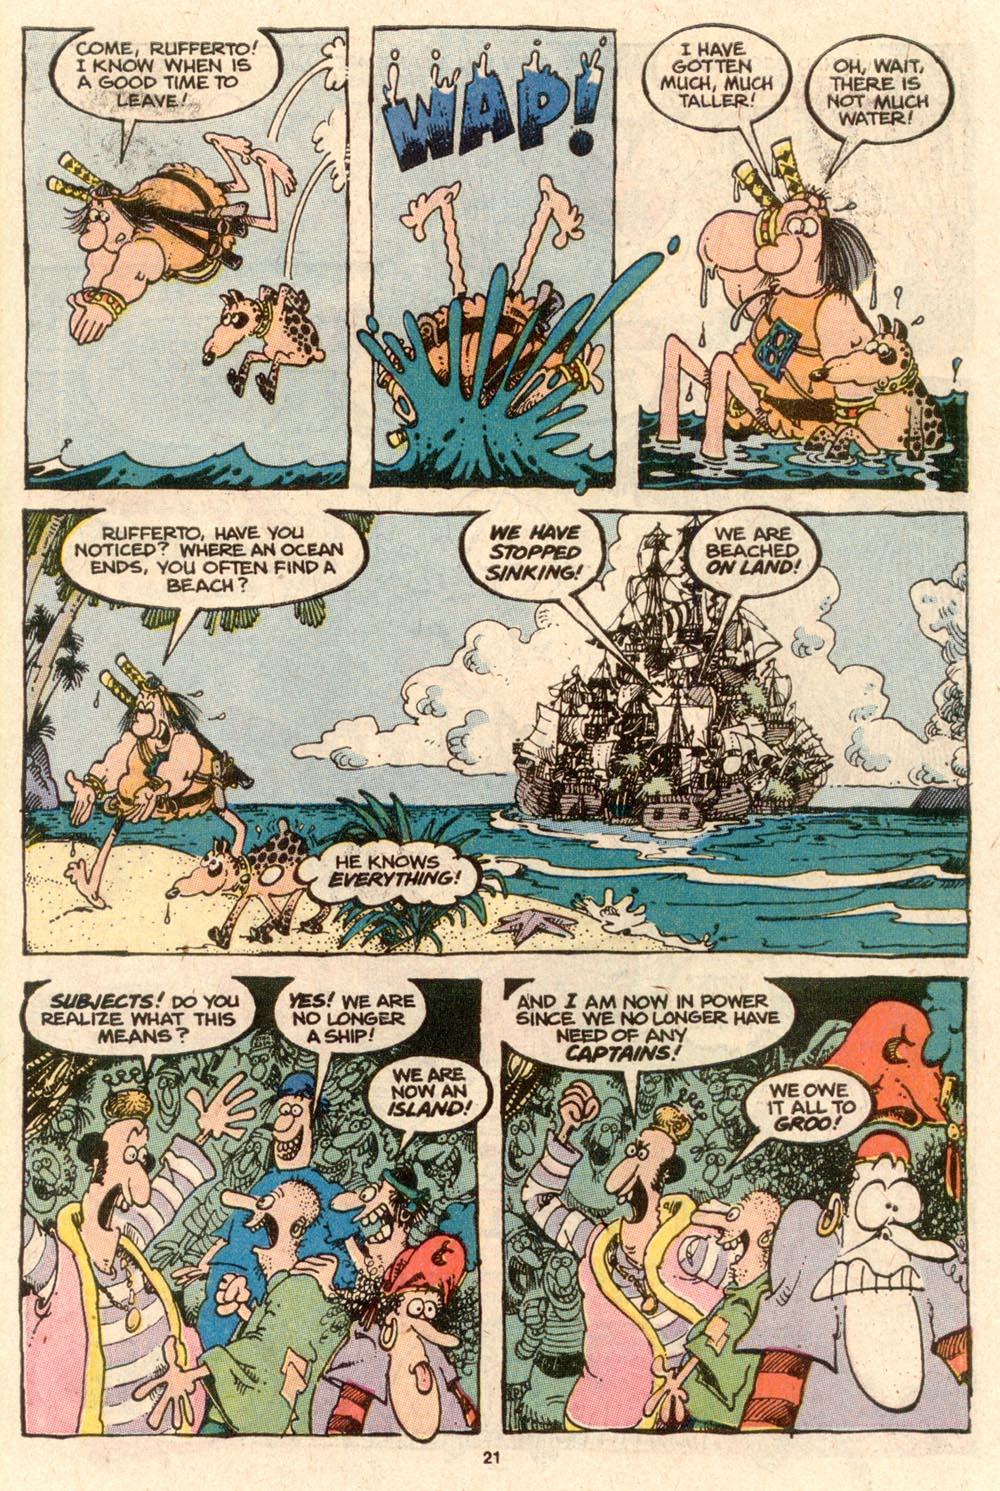 Read online Sergio Aragonés Groo the Wanderer comic -  Issue #57 - 22